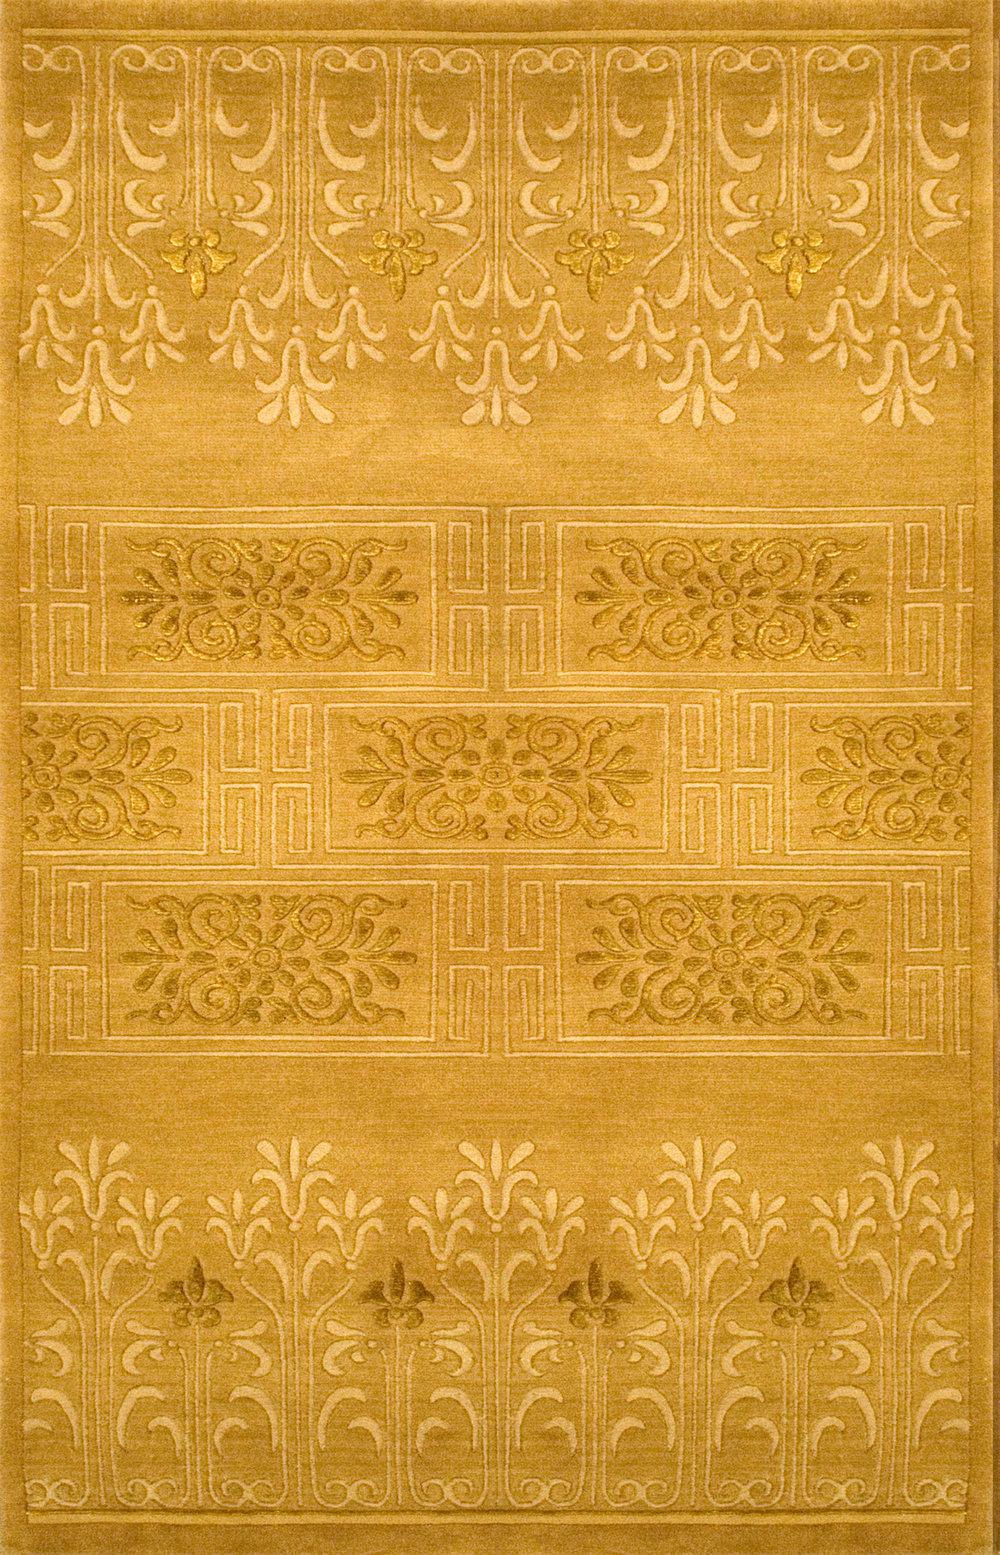 Golden Fields Rug.jpg